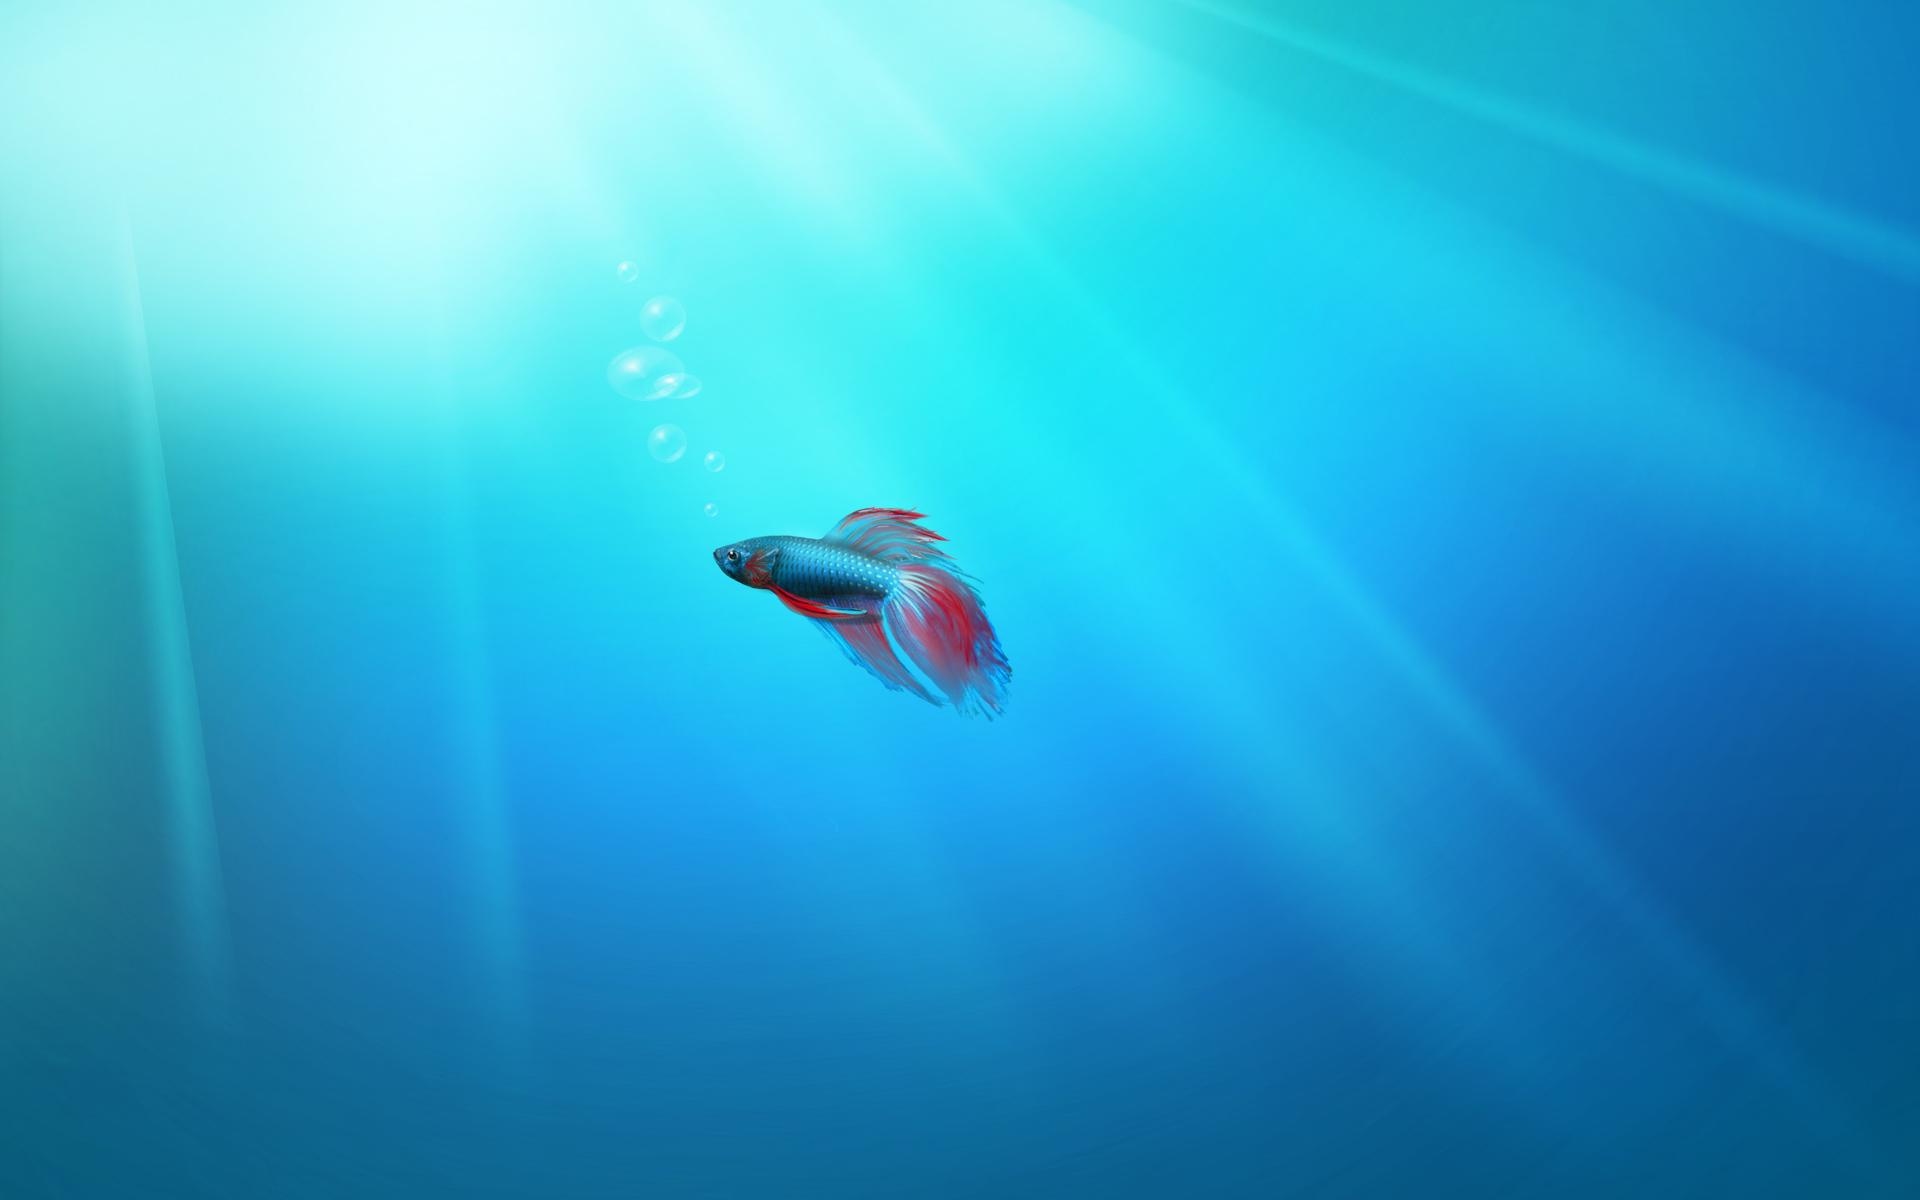 Lonely fish Windows 7 wallpaper